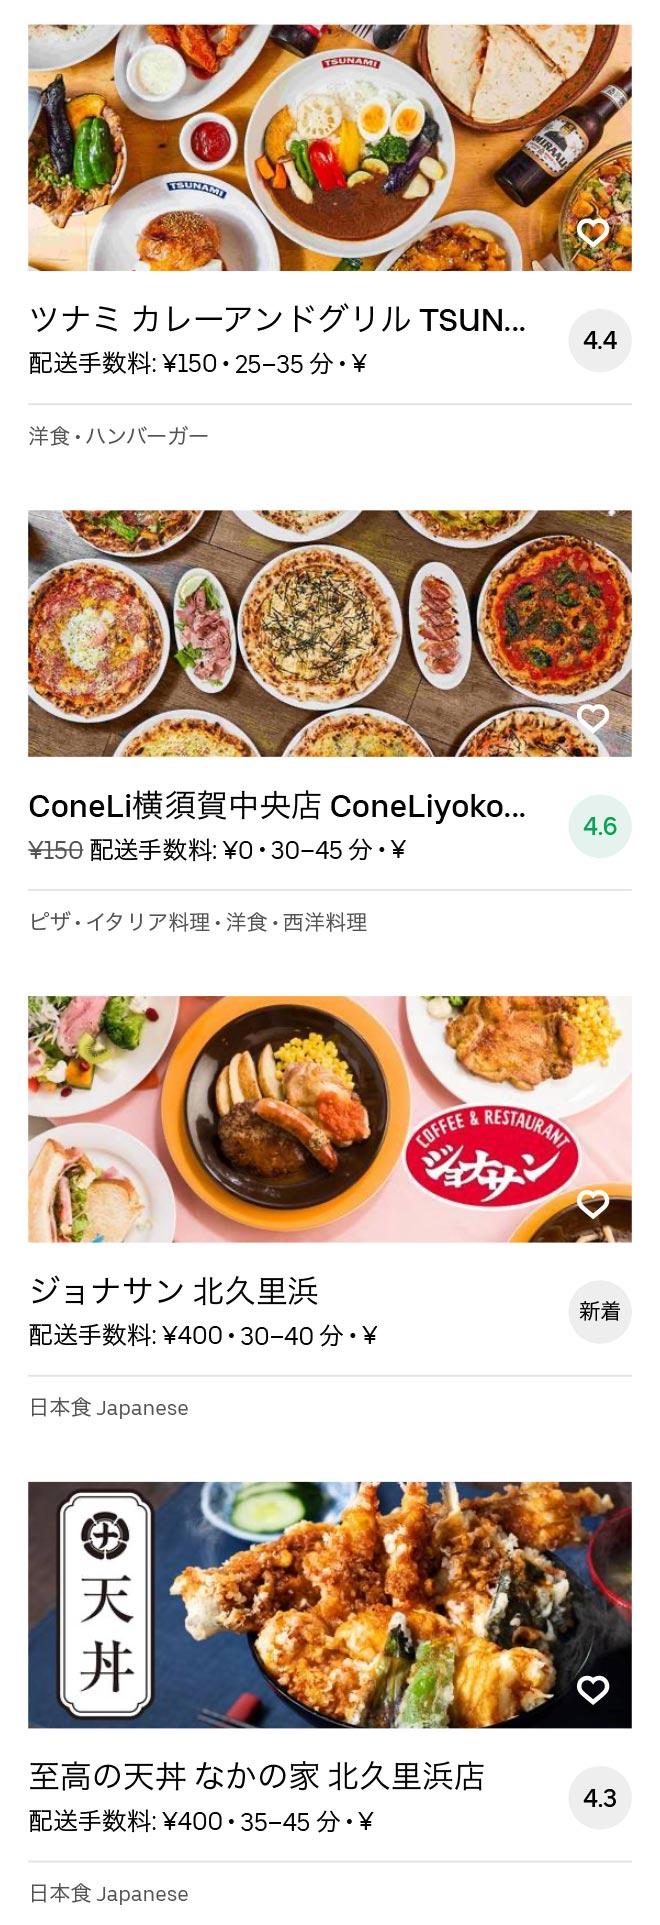 Yokosuka chuo menu 2008 06